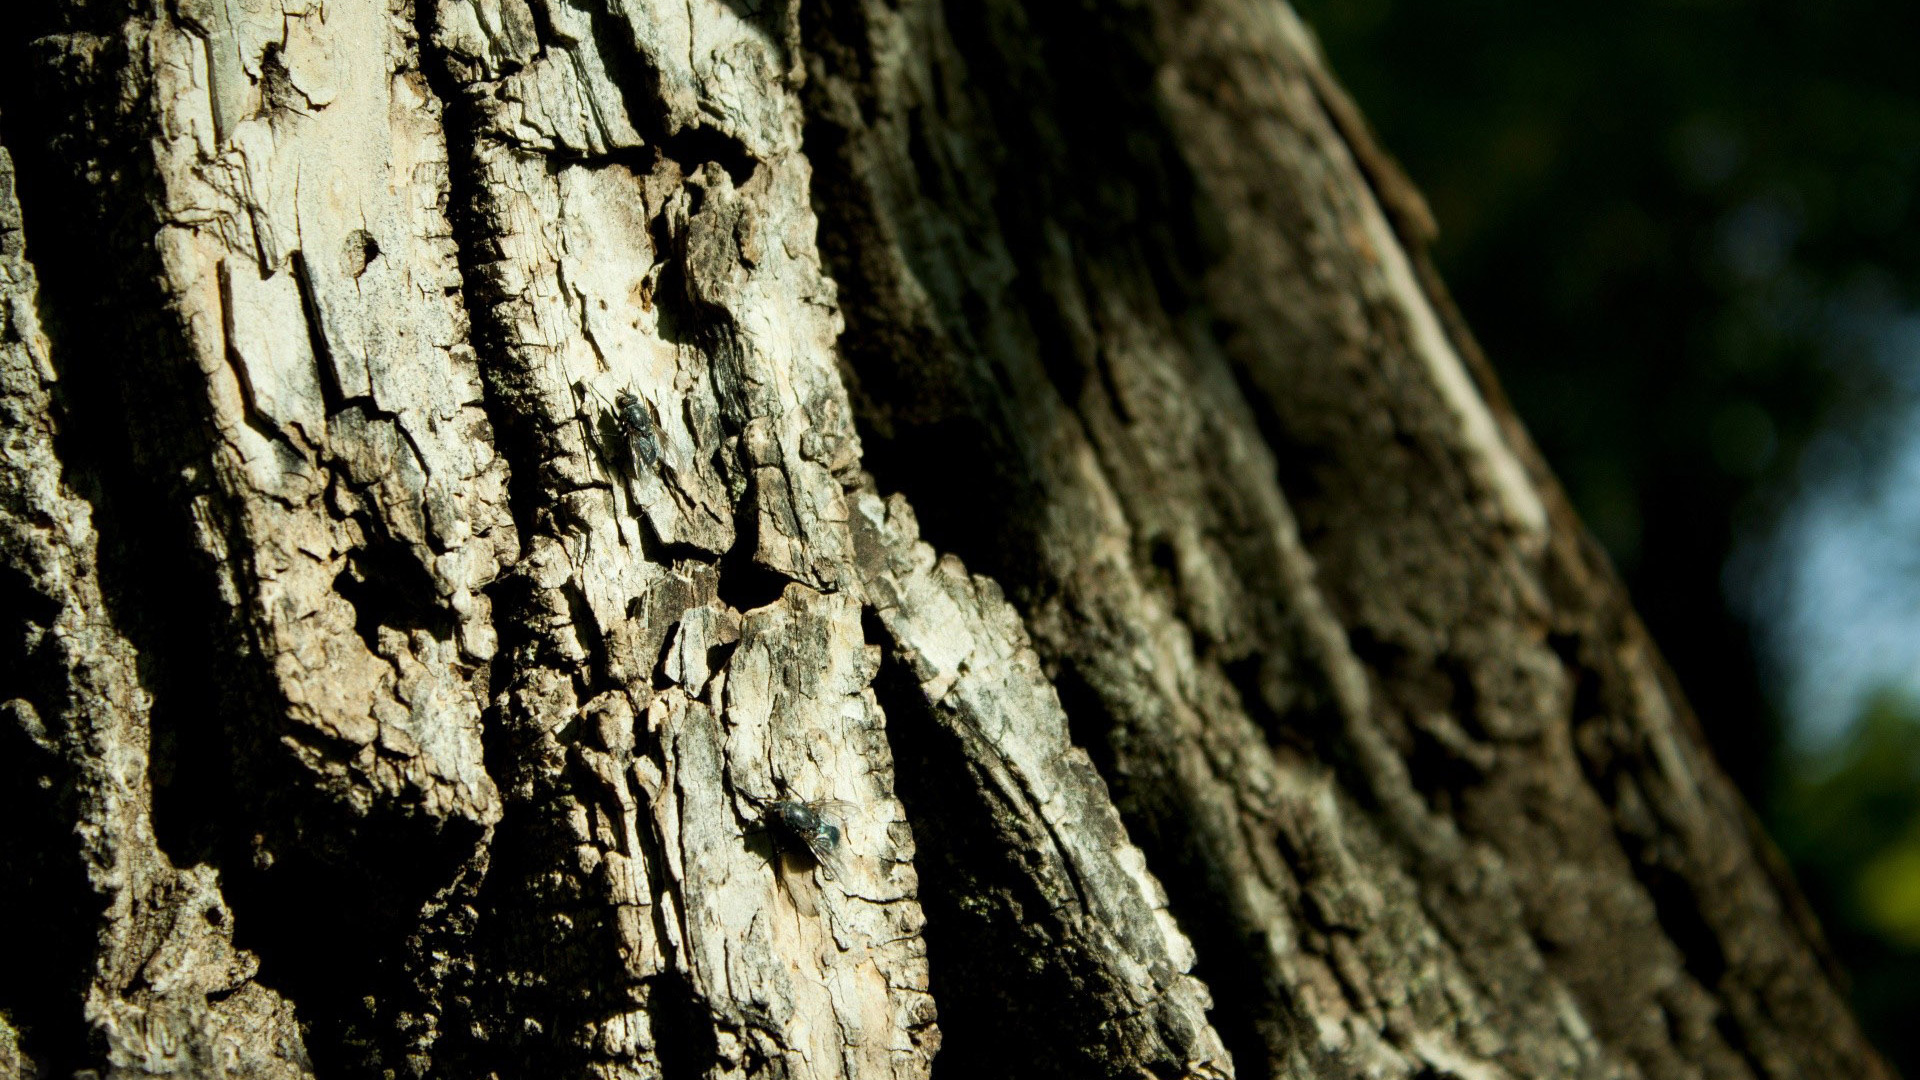 Tree bark wallpaper 11420 1920x1080